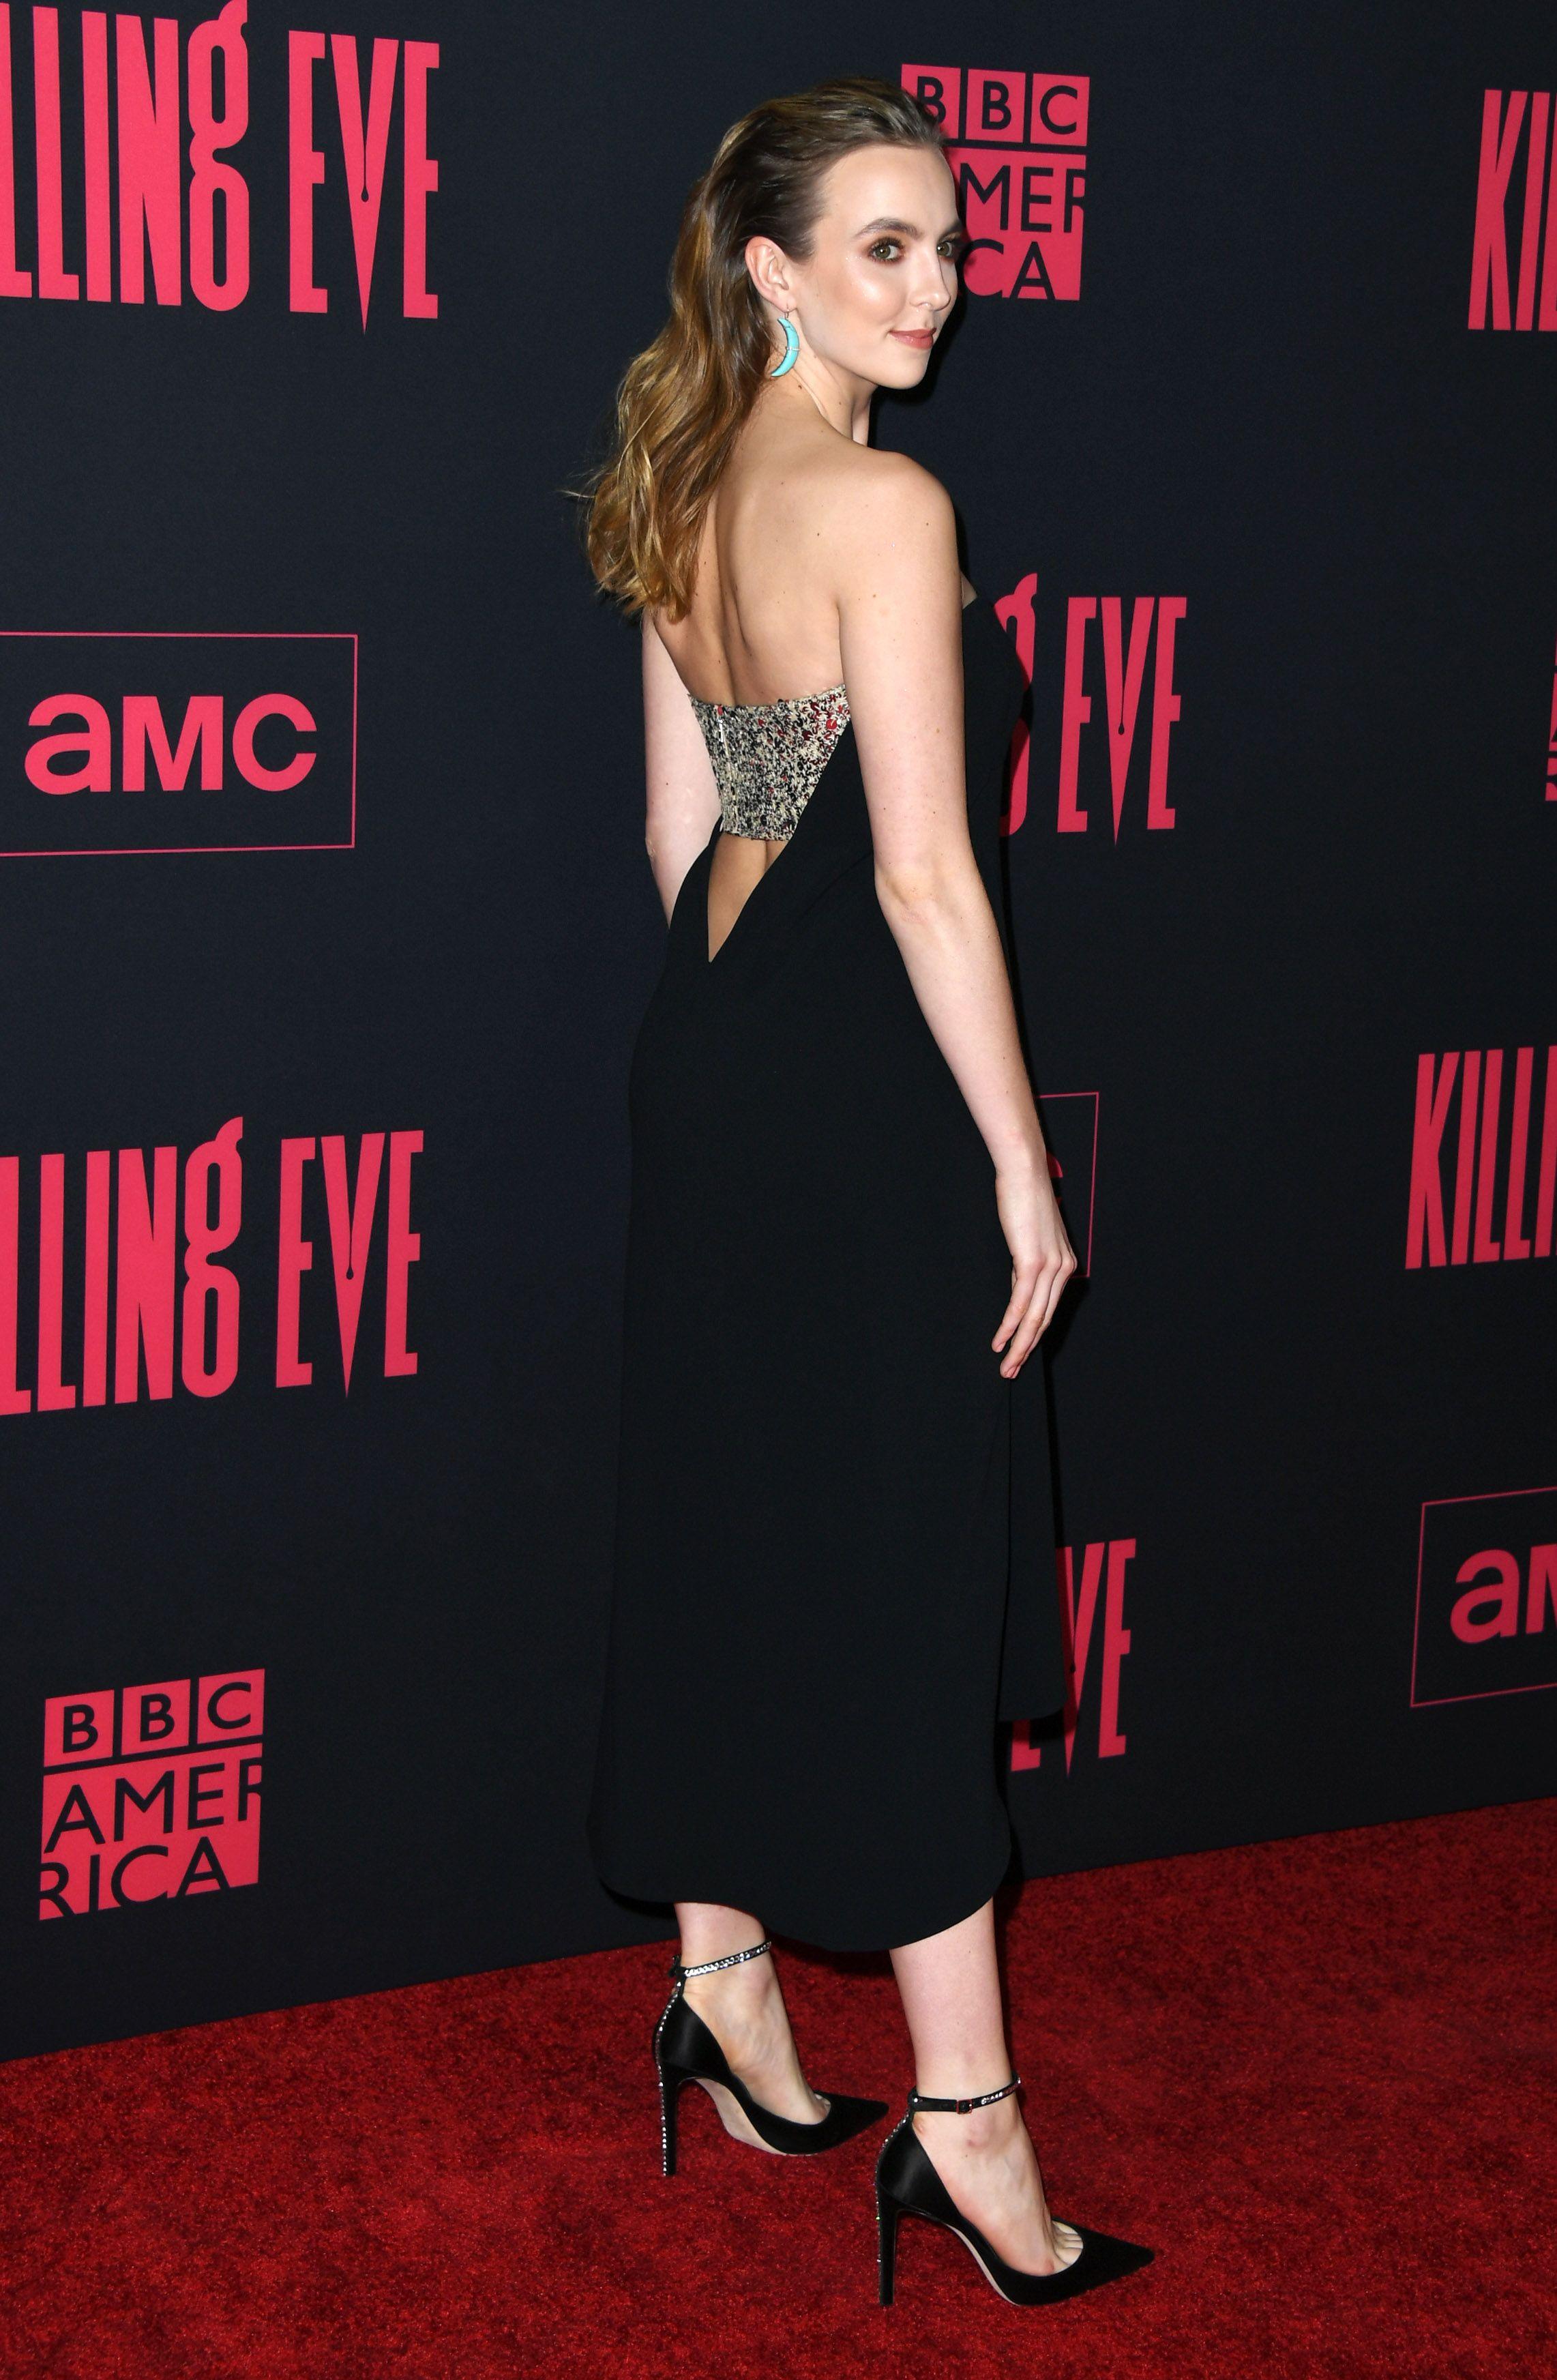 Premiere Of BBC America And AMC's 'Killing Eve' Season 2 - Arrivals